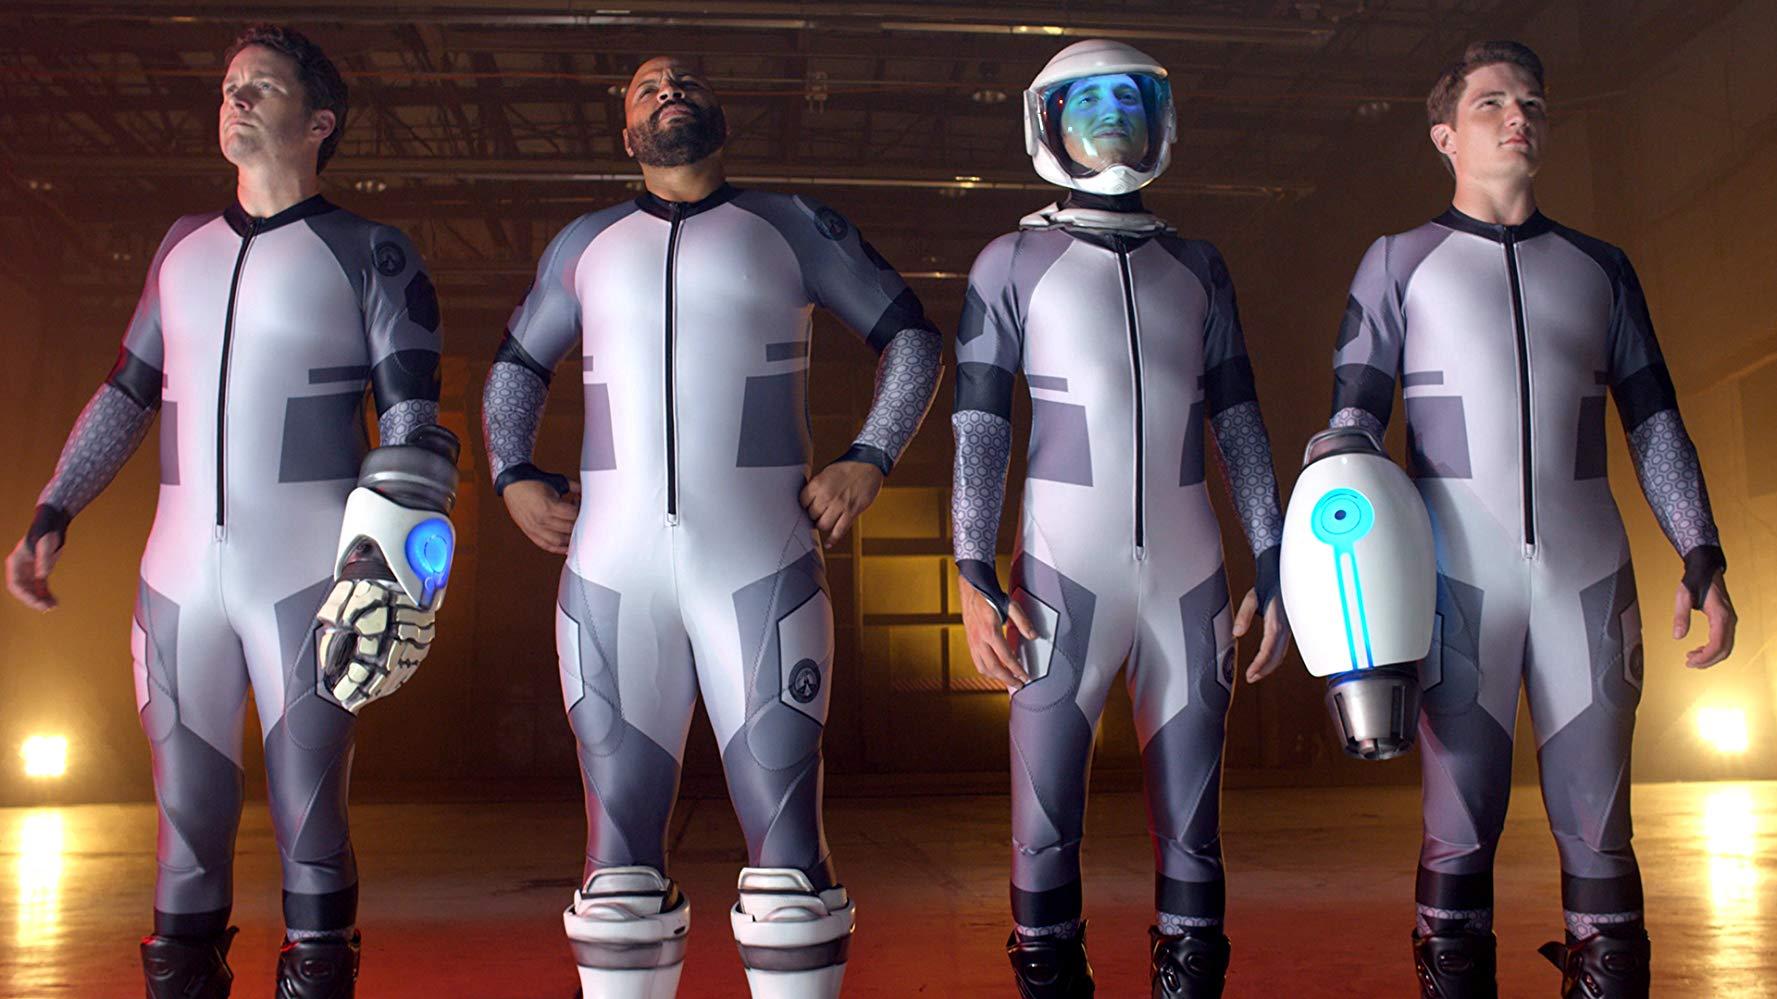 Burnie Burns, Colton Dunn, Gavin Free and Michael Jones in Lazer Team (2015)